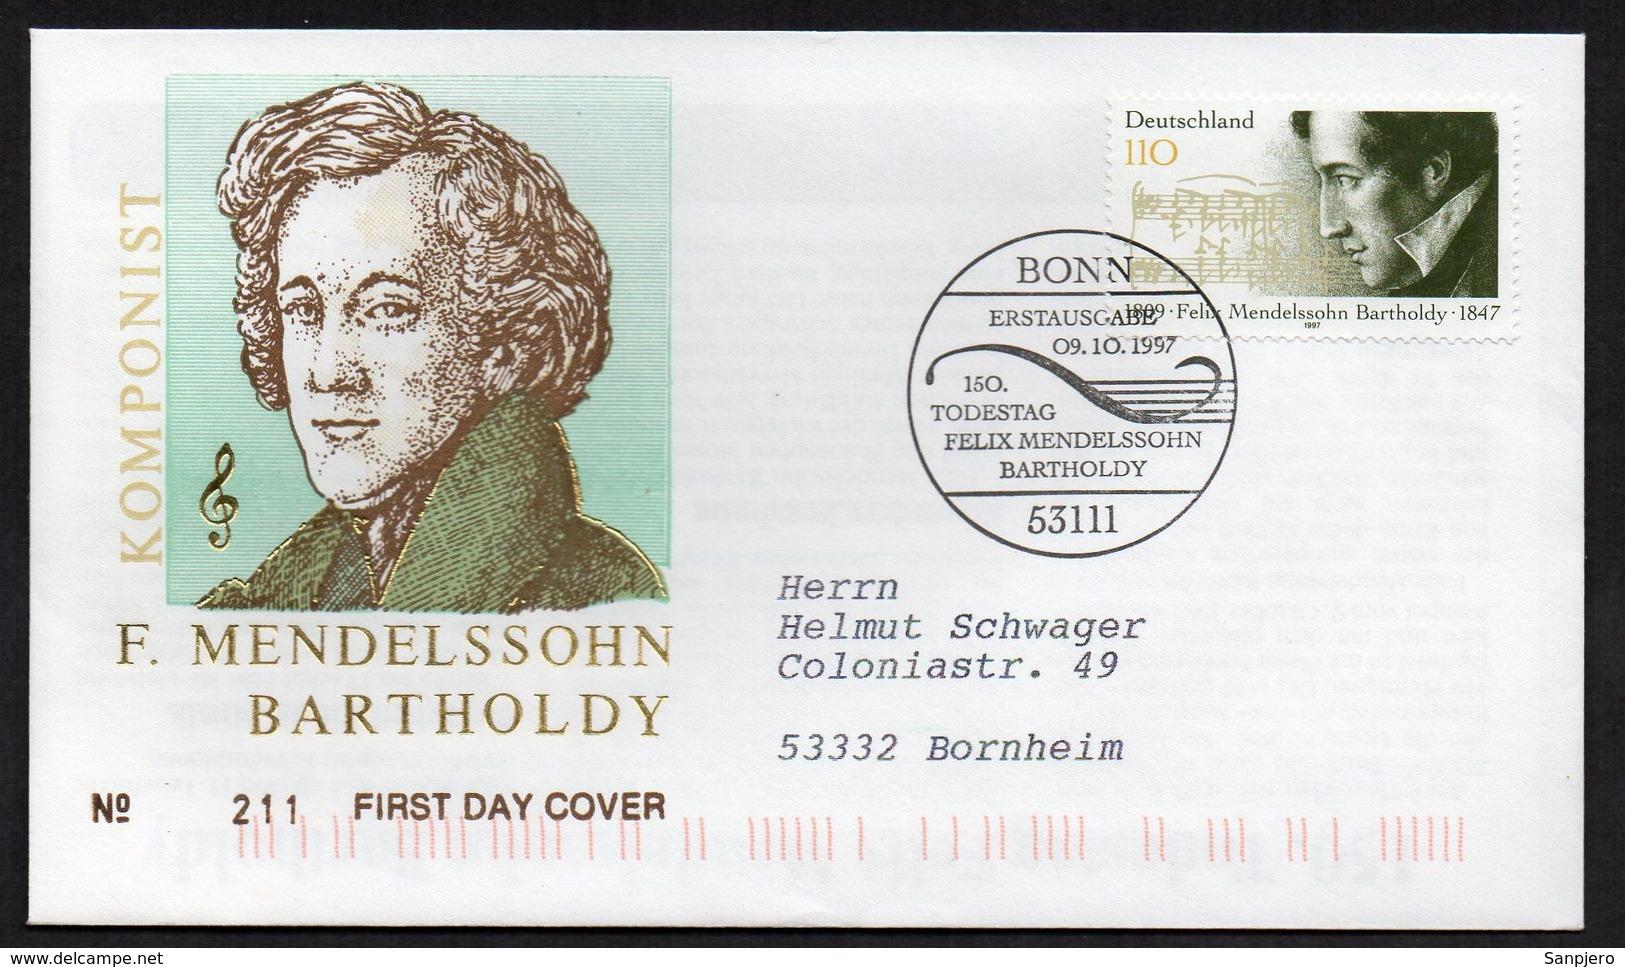 FELIX MENDELSSOHN BARTHOLDY, FDC 1€ - Celebrità